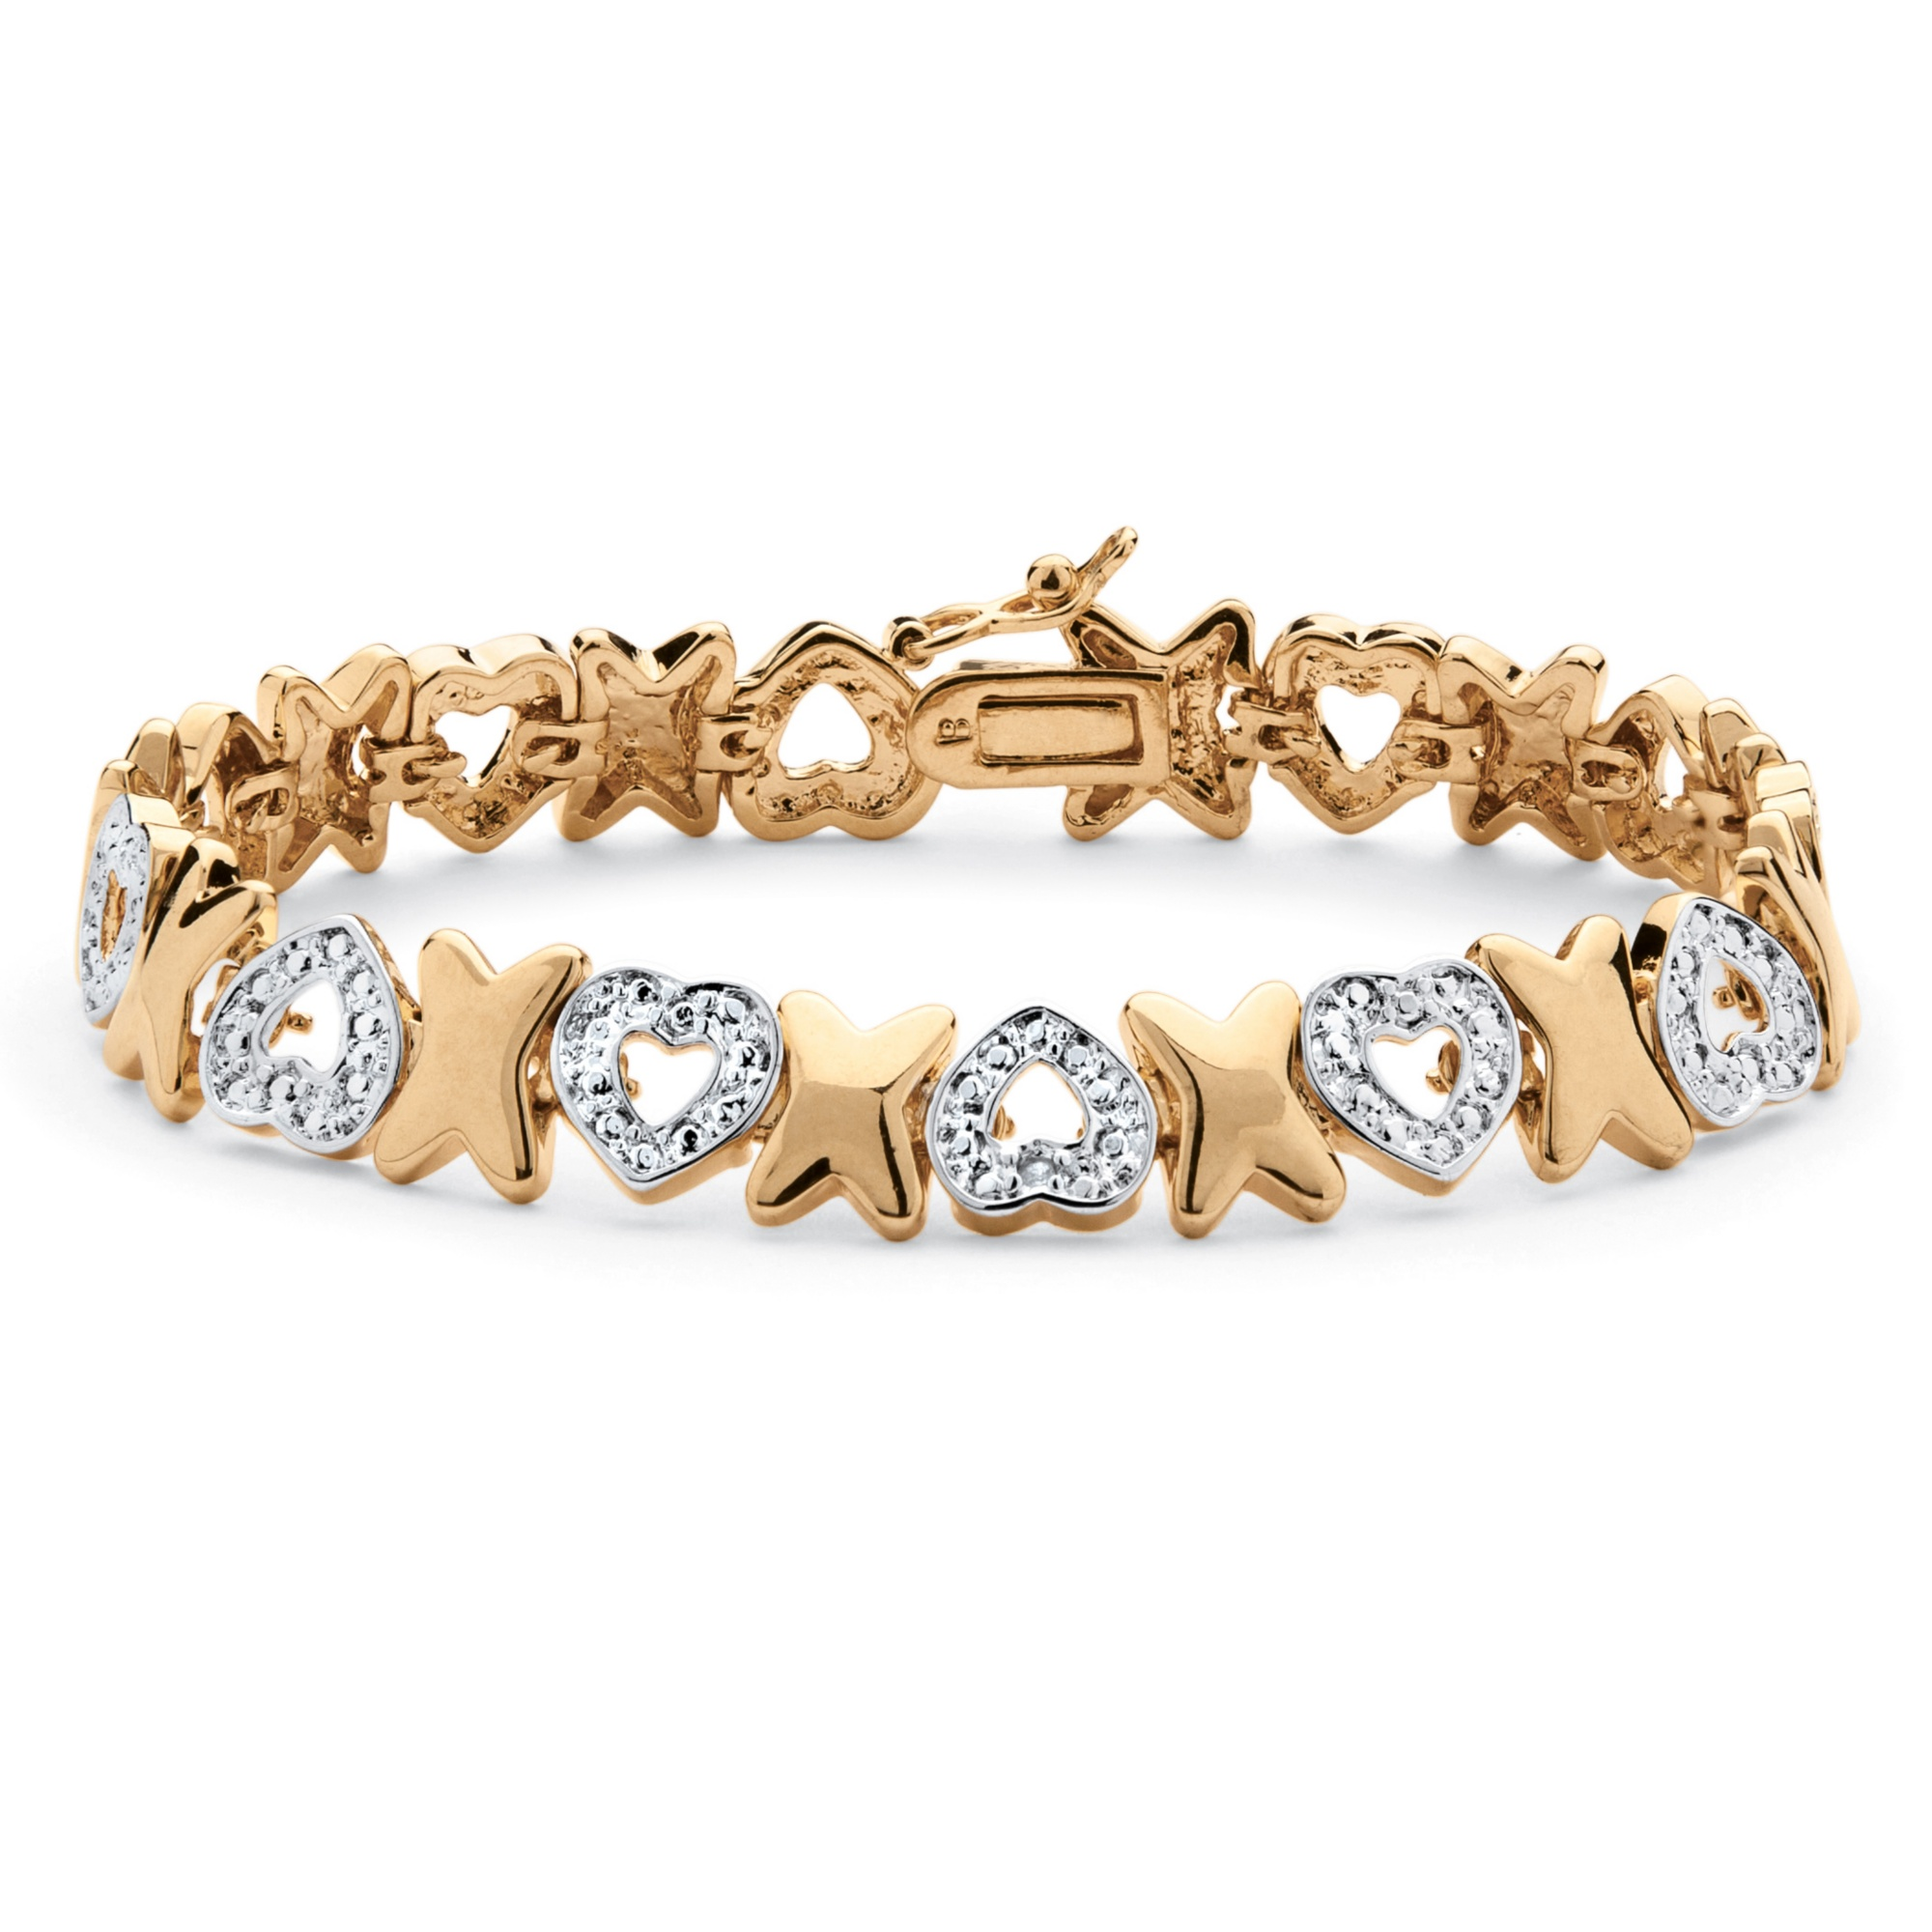 Diamond Accent Hearts And Kisses Pave Bracelet 18k Gold